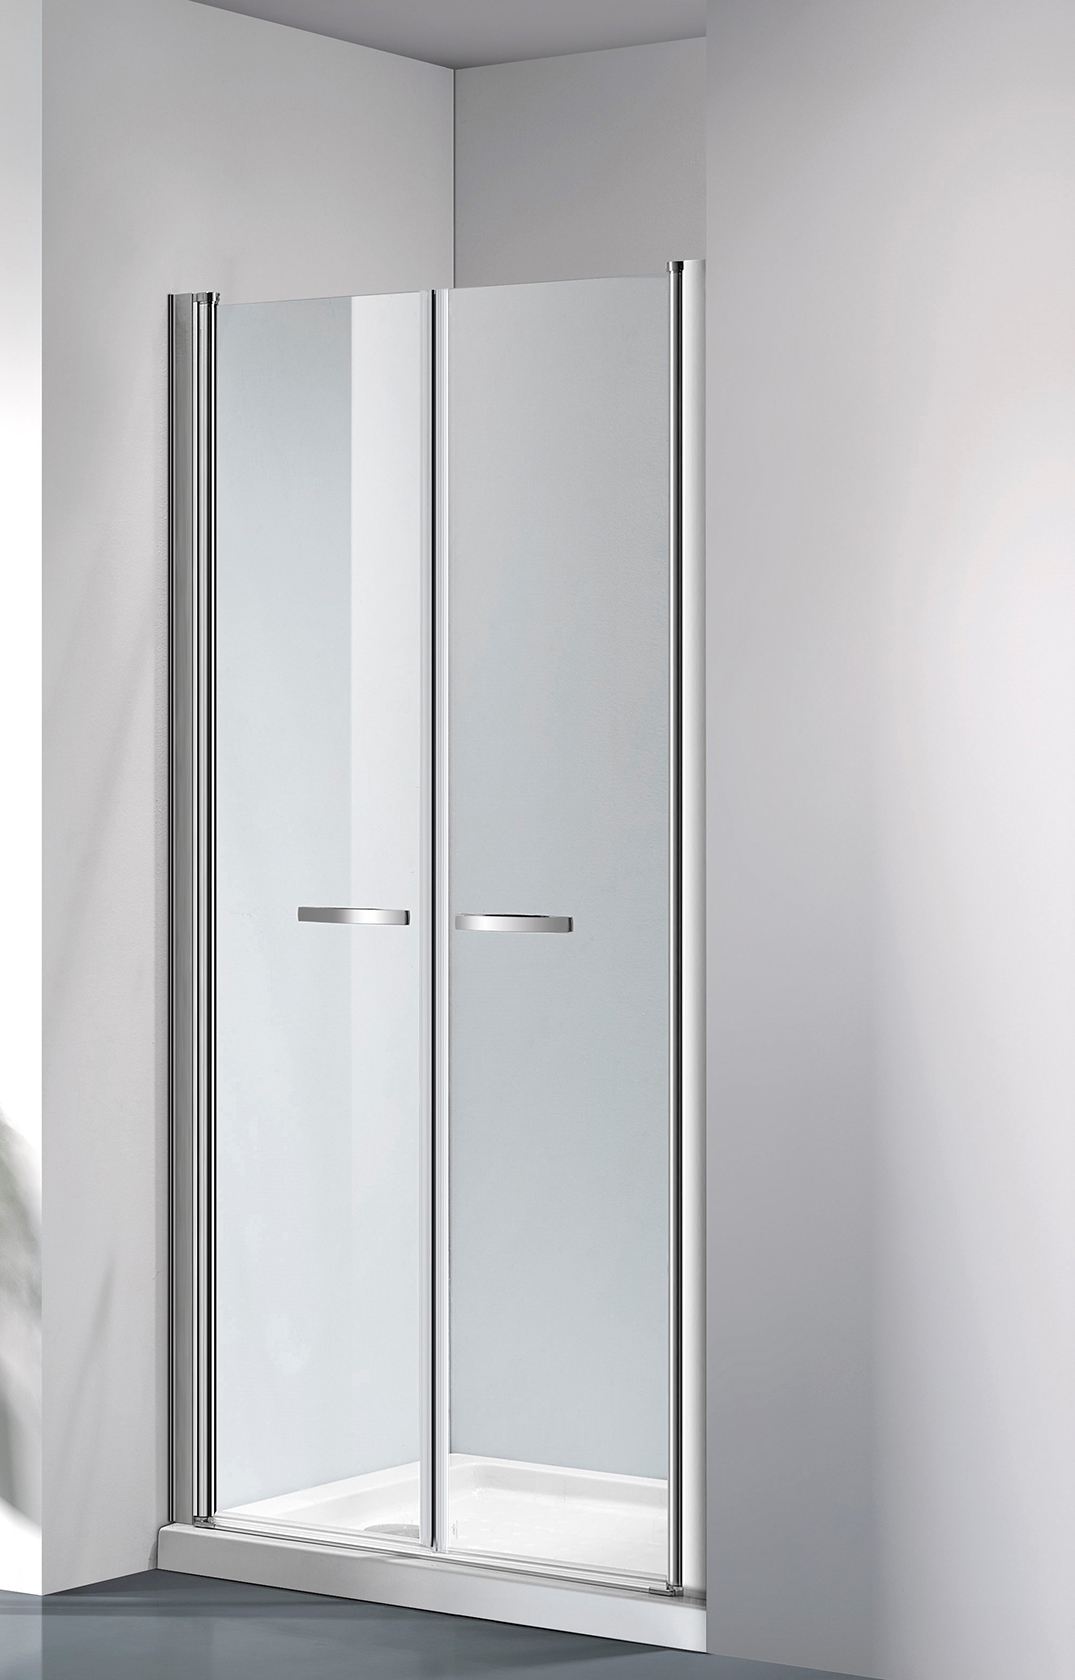 ARTTEC COMFORT 96-101 grape NEW - Sprchové dveře do niky